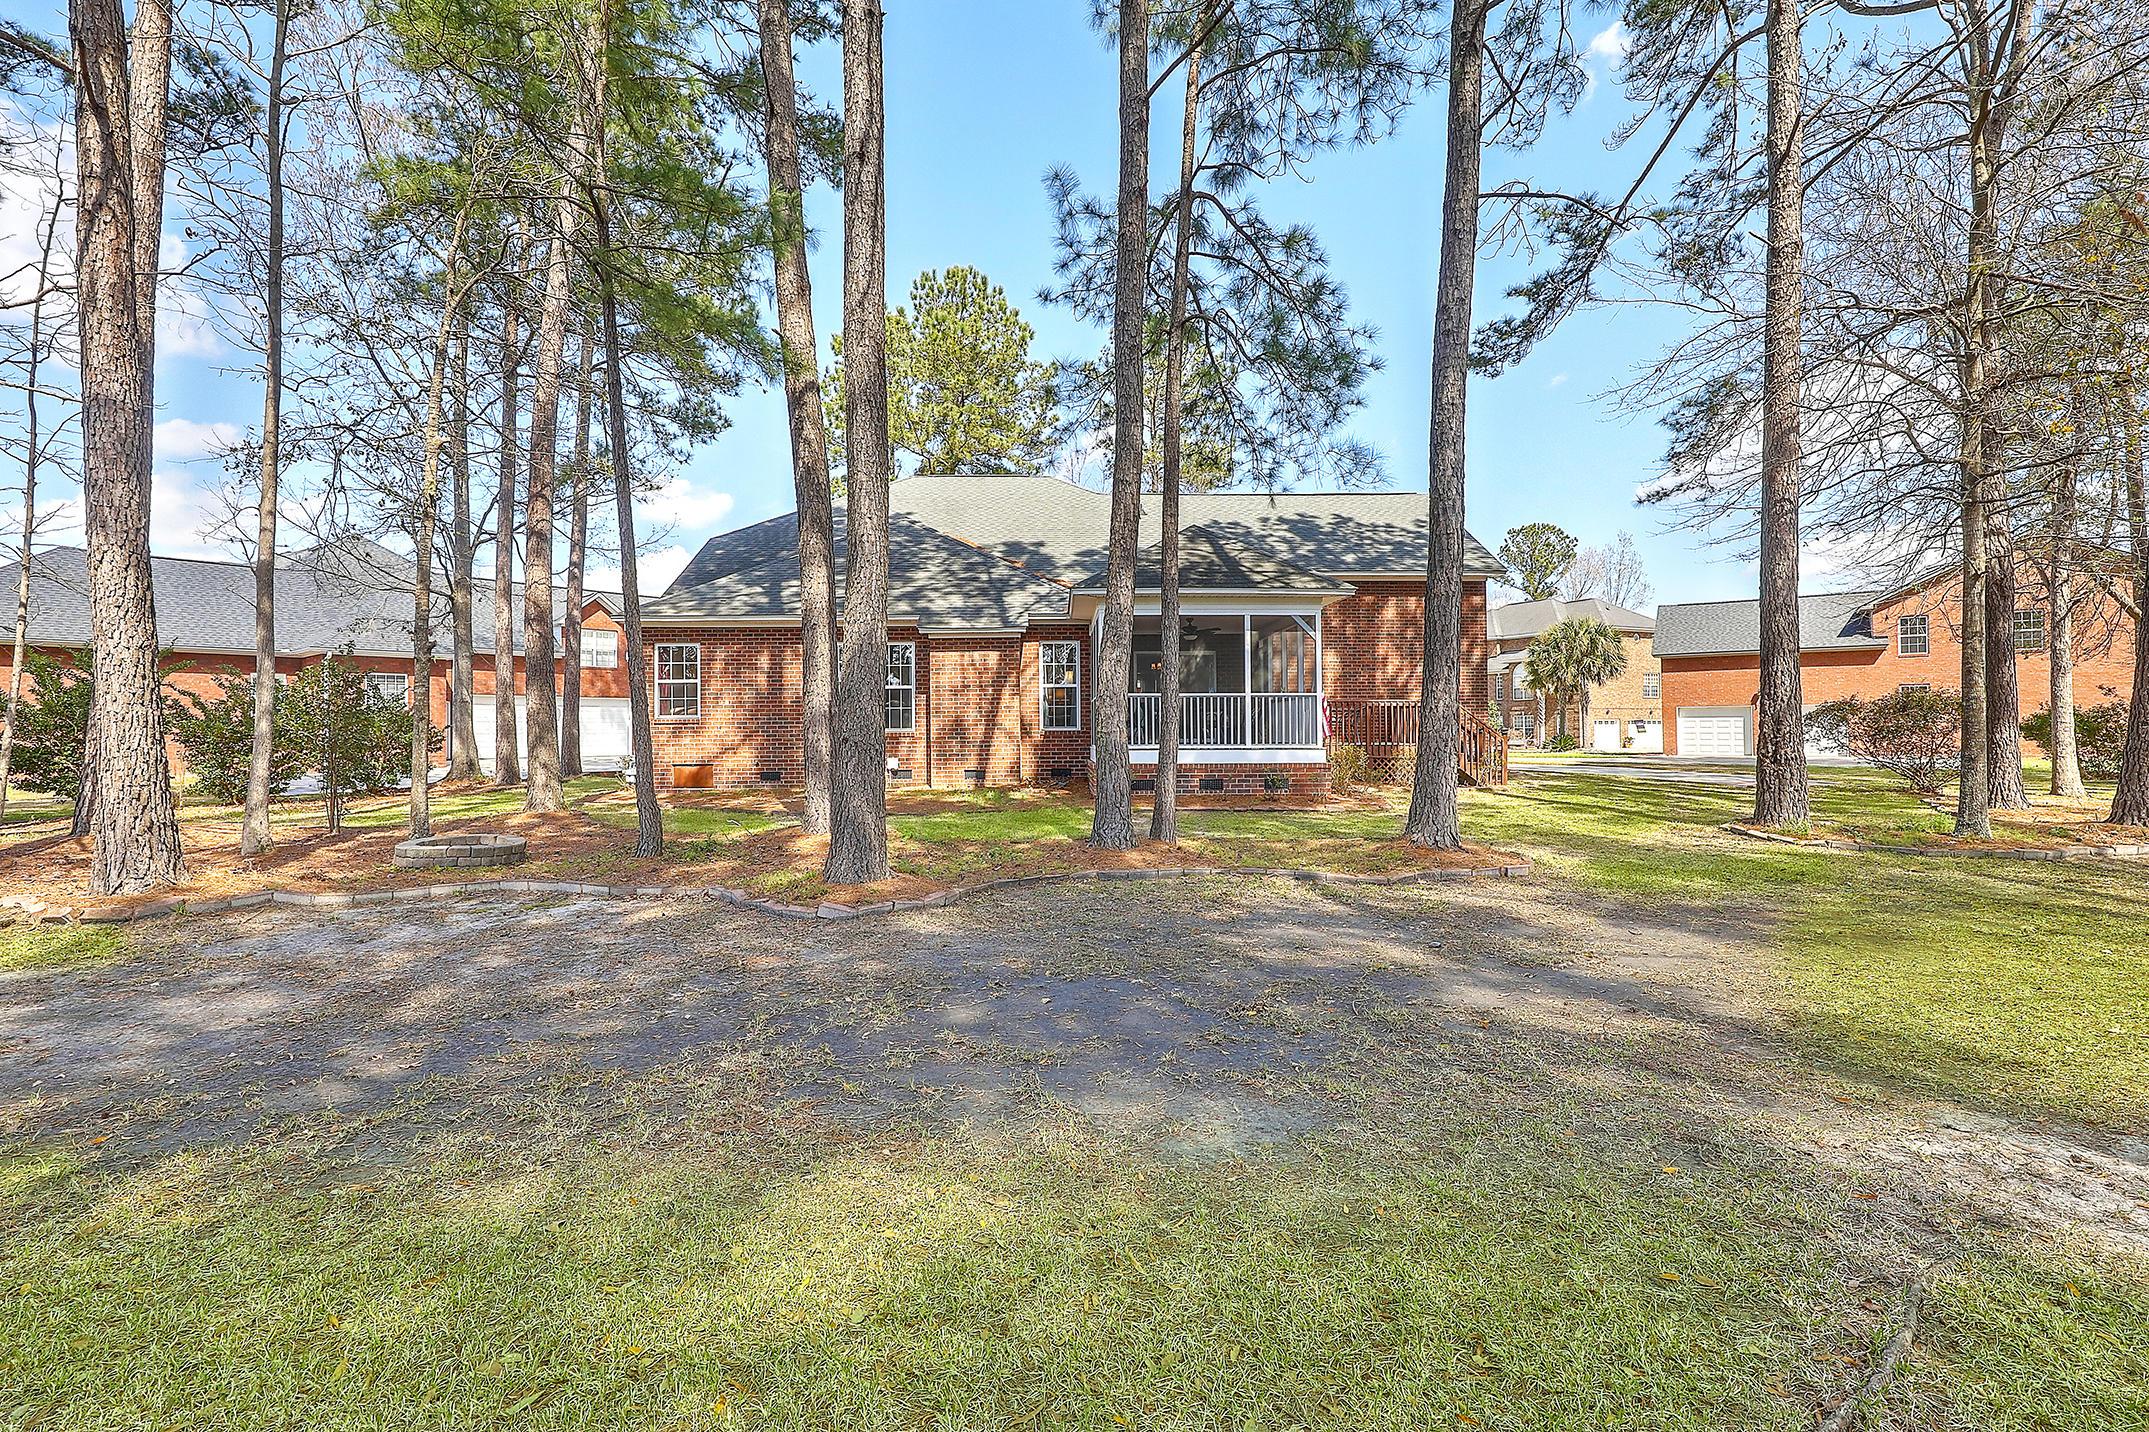 152 Welchman Avenue Goose Creek, Sc 29445